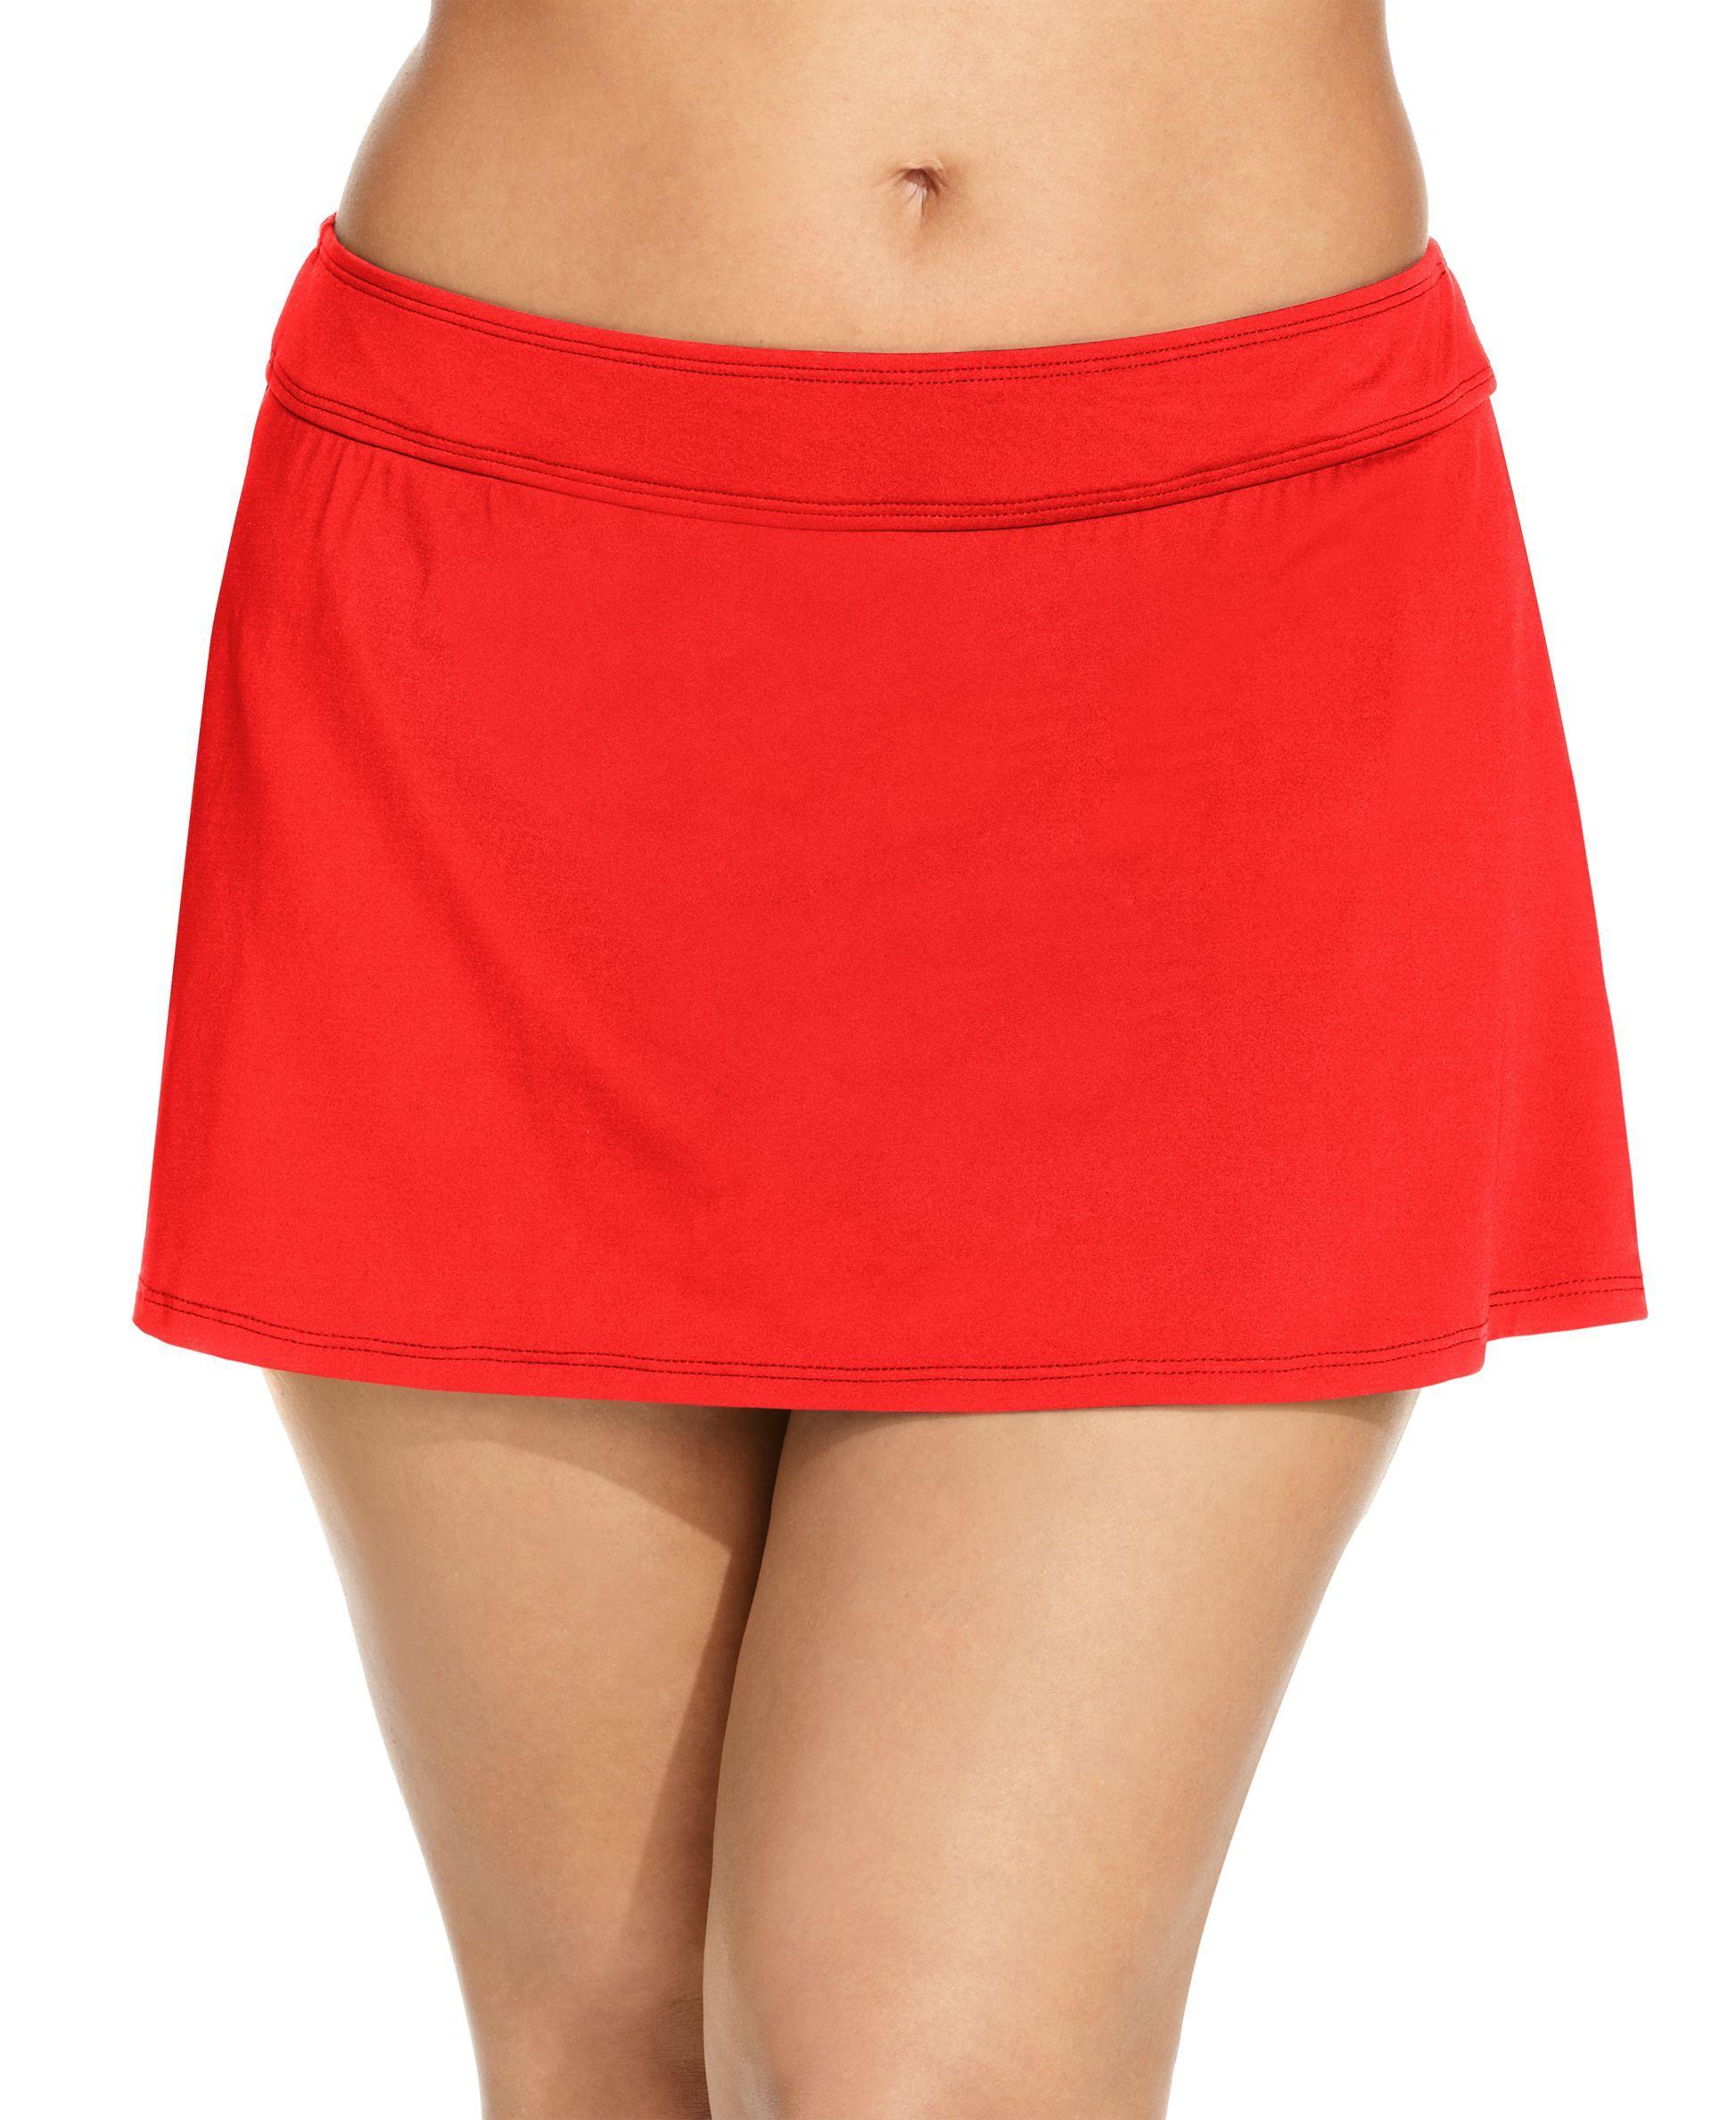 17b97985f8c Anne Cole Plus Size Swim Skirt | Products | Swim skirt, Plus size ...